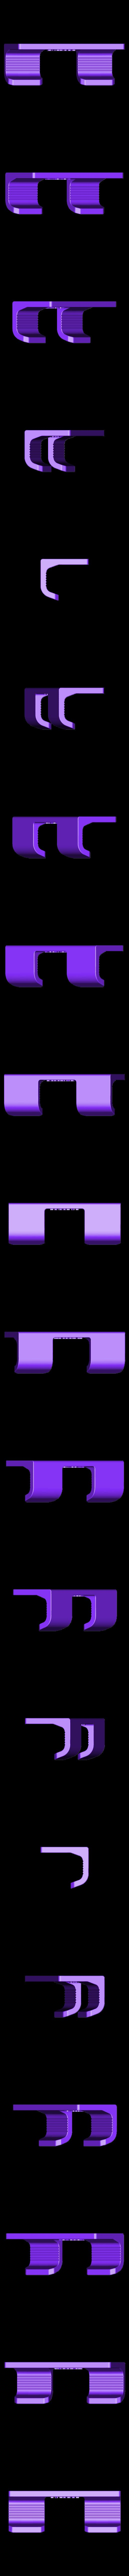 enforce_100_screws.stl Download free STL file Engineers Hammer Holder 100g 027 I for screws or peg board • 3D printer model, Wiesemann1893